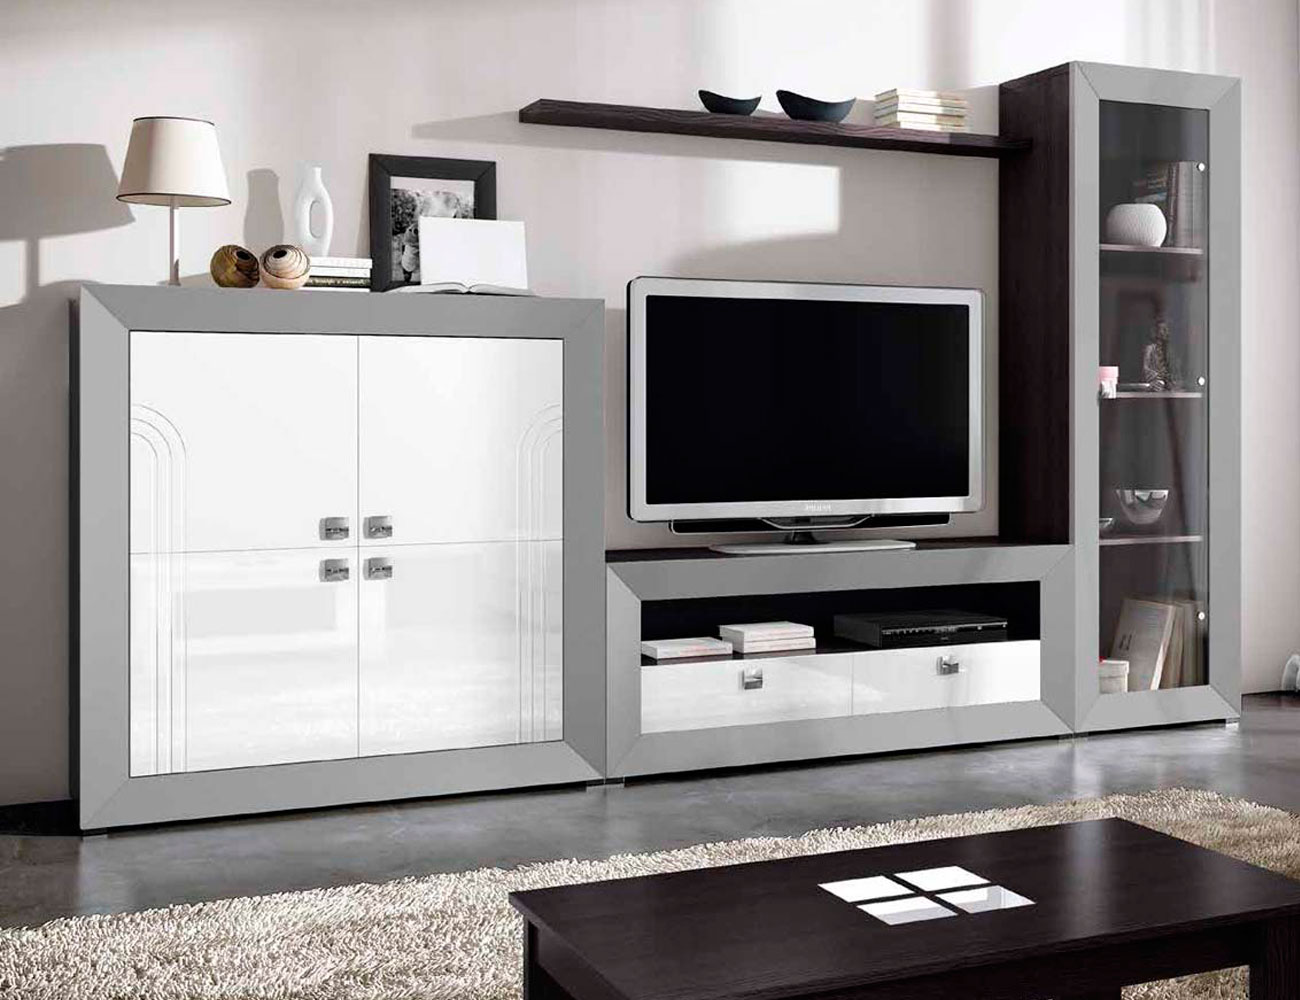 Mueble salon moderno 044